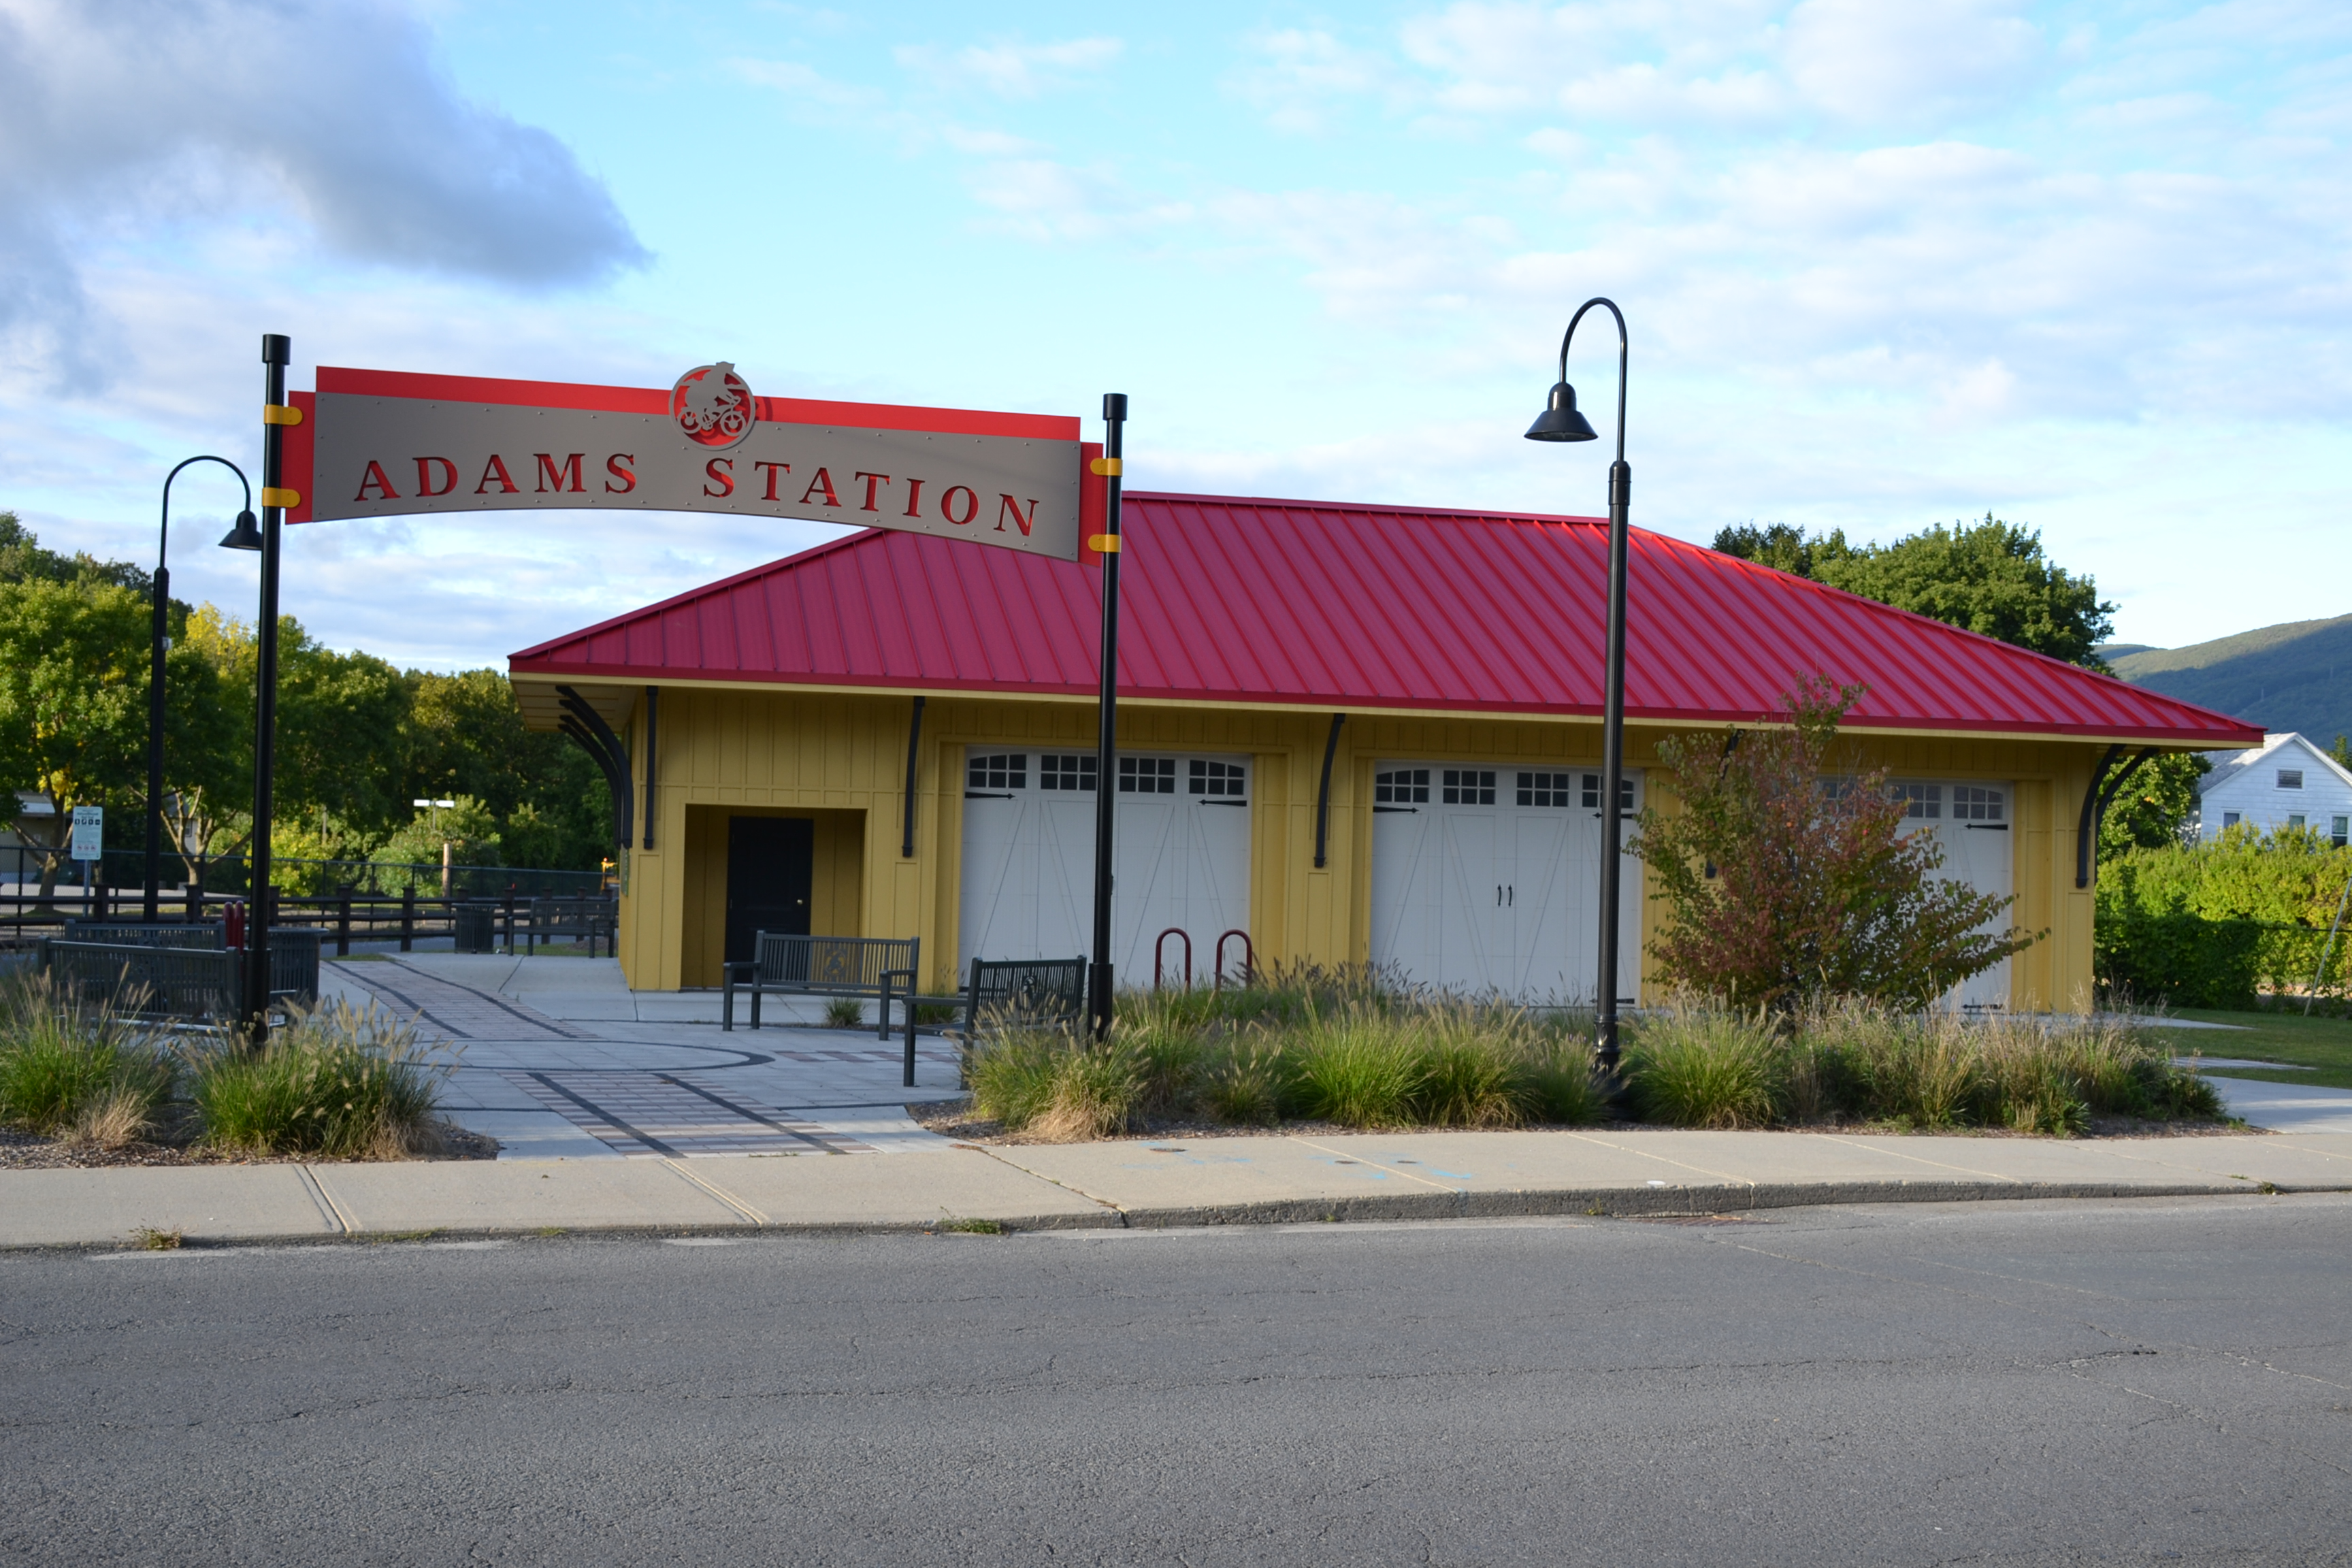 2017_09 Adams Station 1 cultural